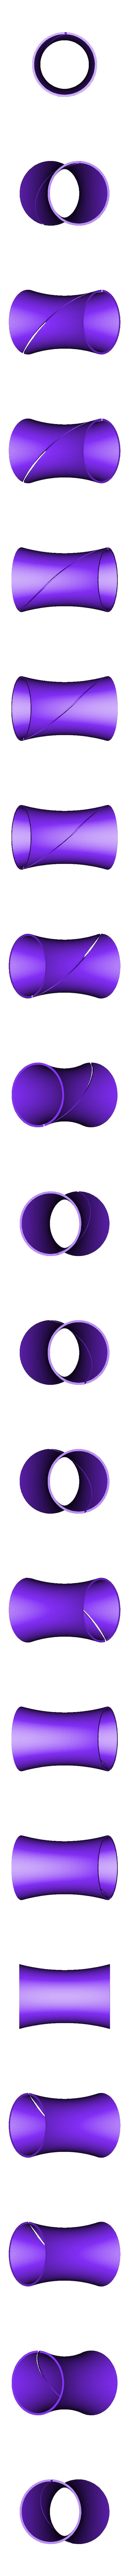 Handle_2.stl Download STL file Shape Shaker_Caterpillar • Design to 3D print, Ocrobus